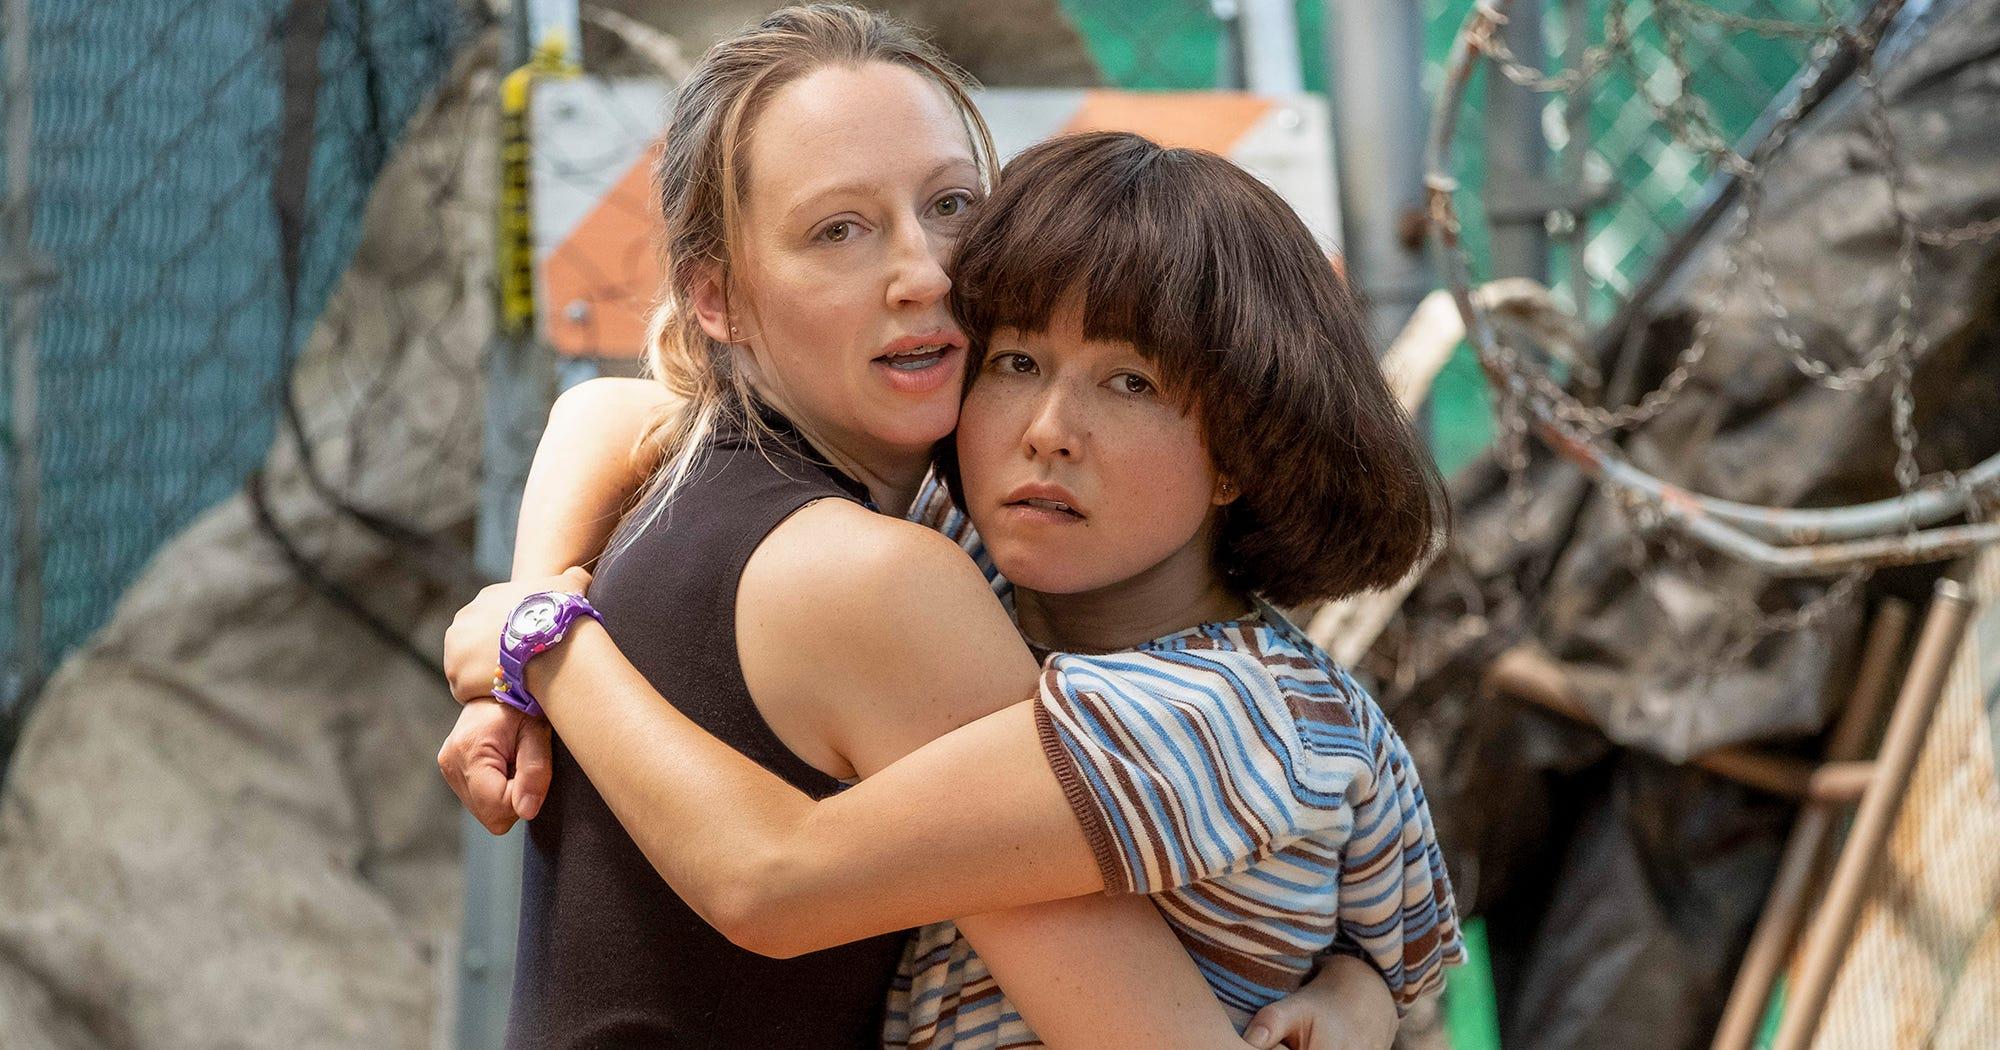 PEN15: Hulu PEN15 Series Is Based On Mortifyingly True Stories